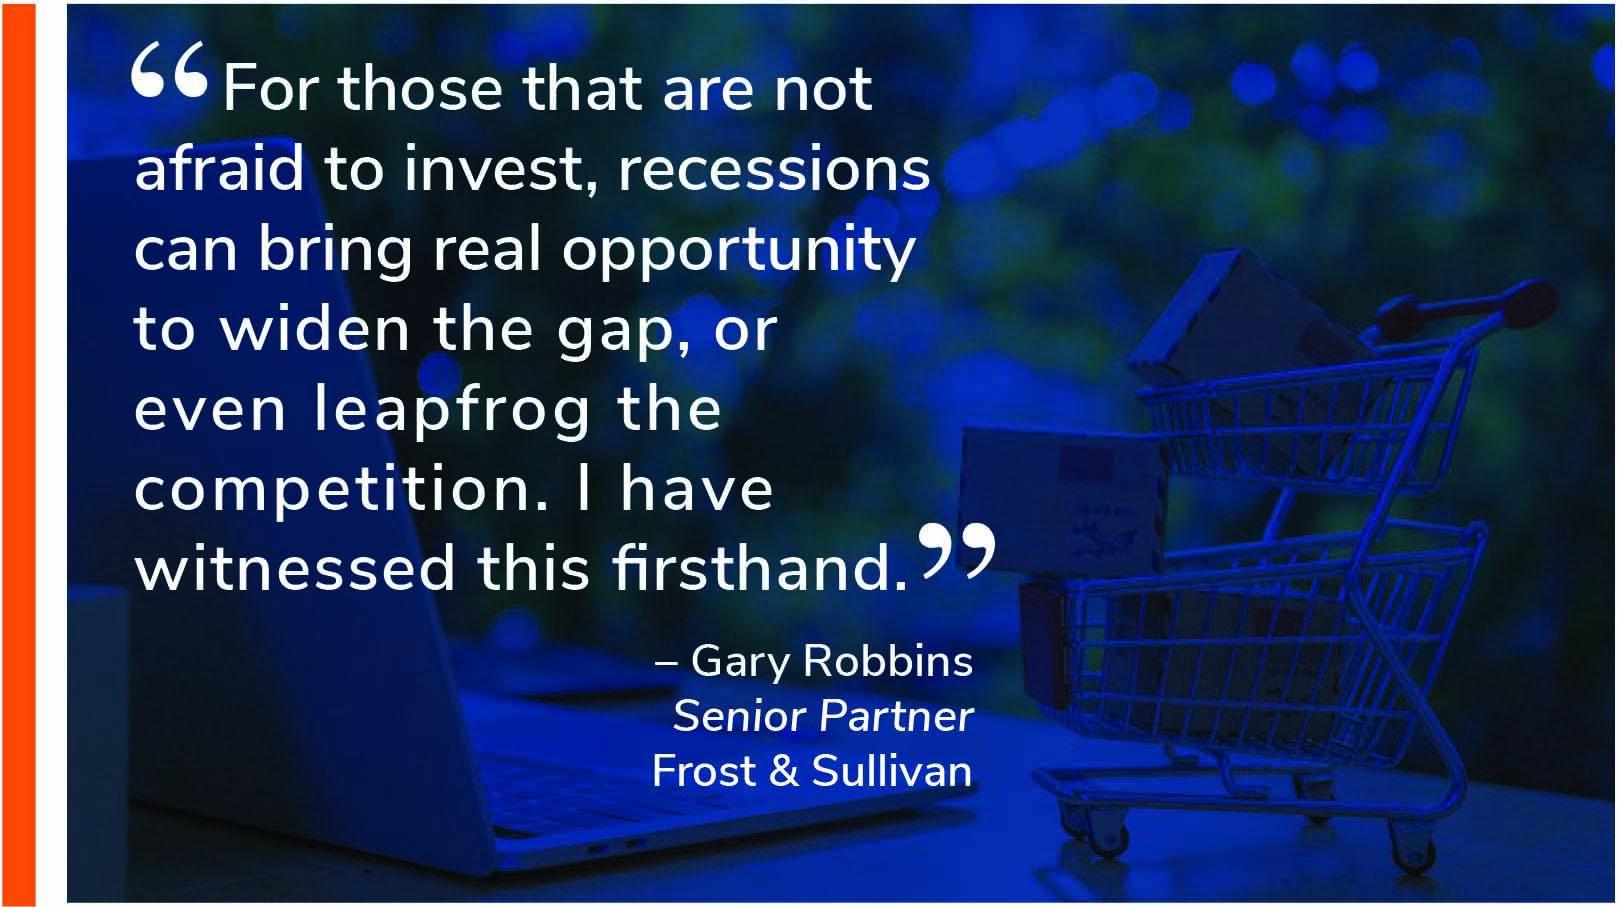 Frost & Sullivan Quote